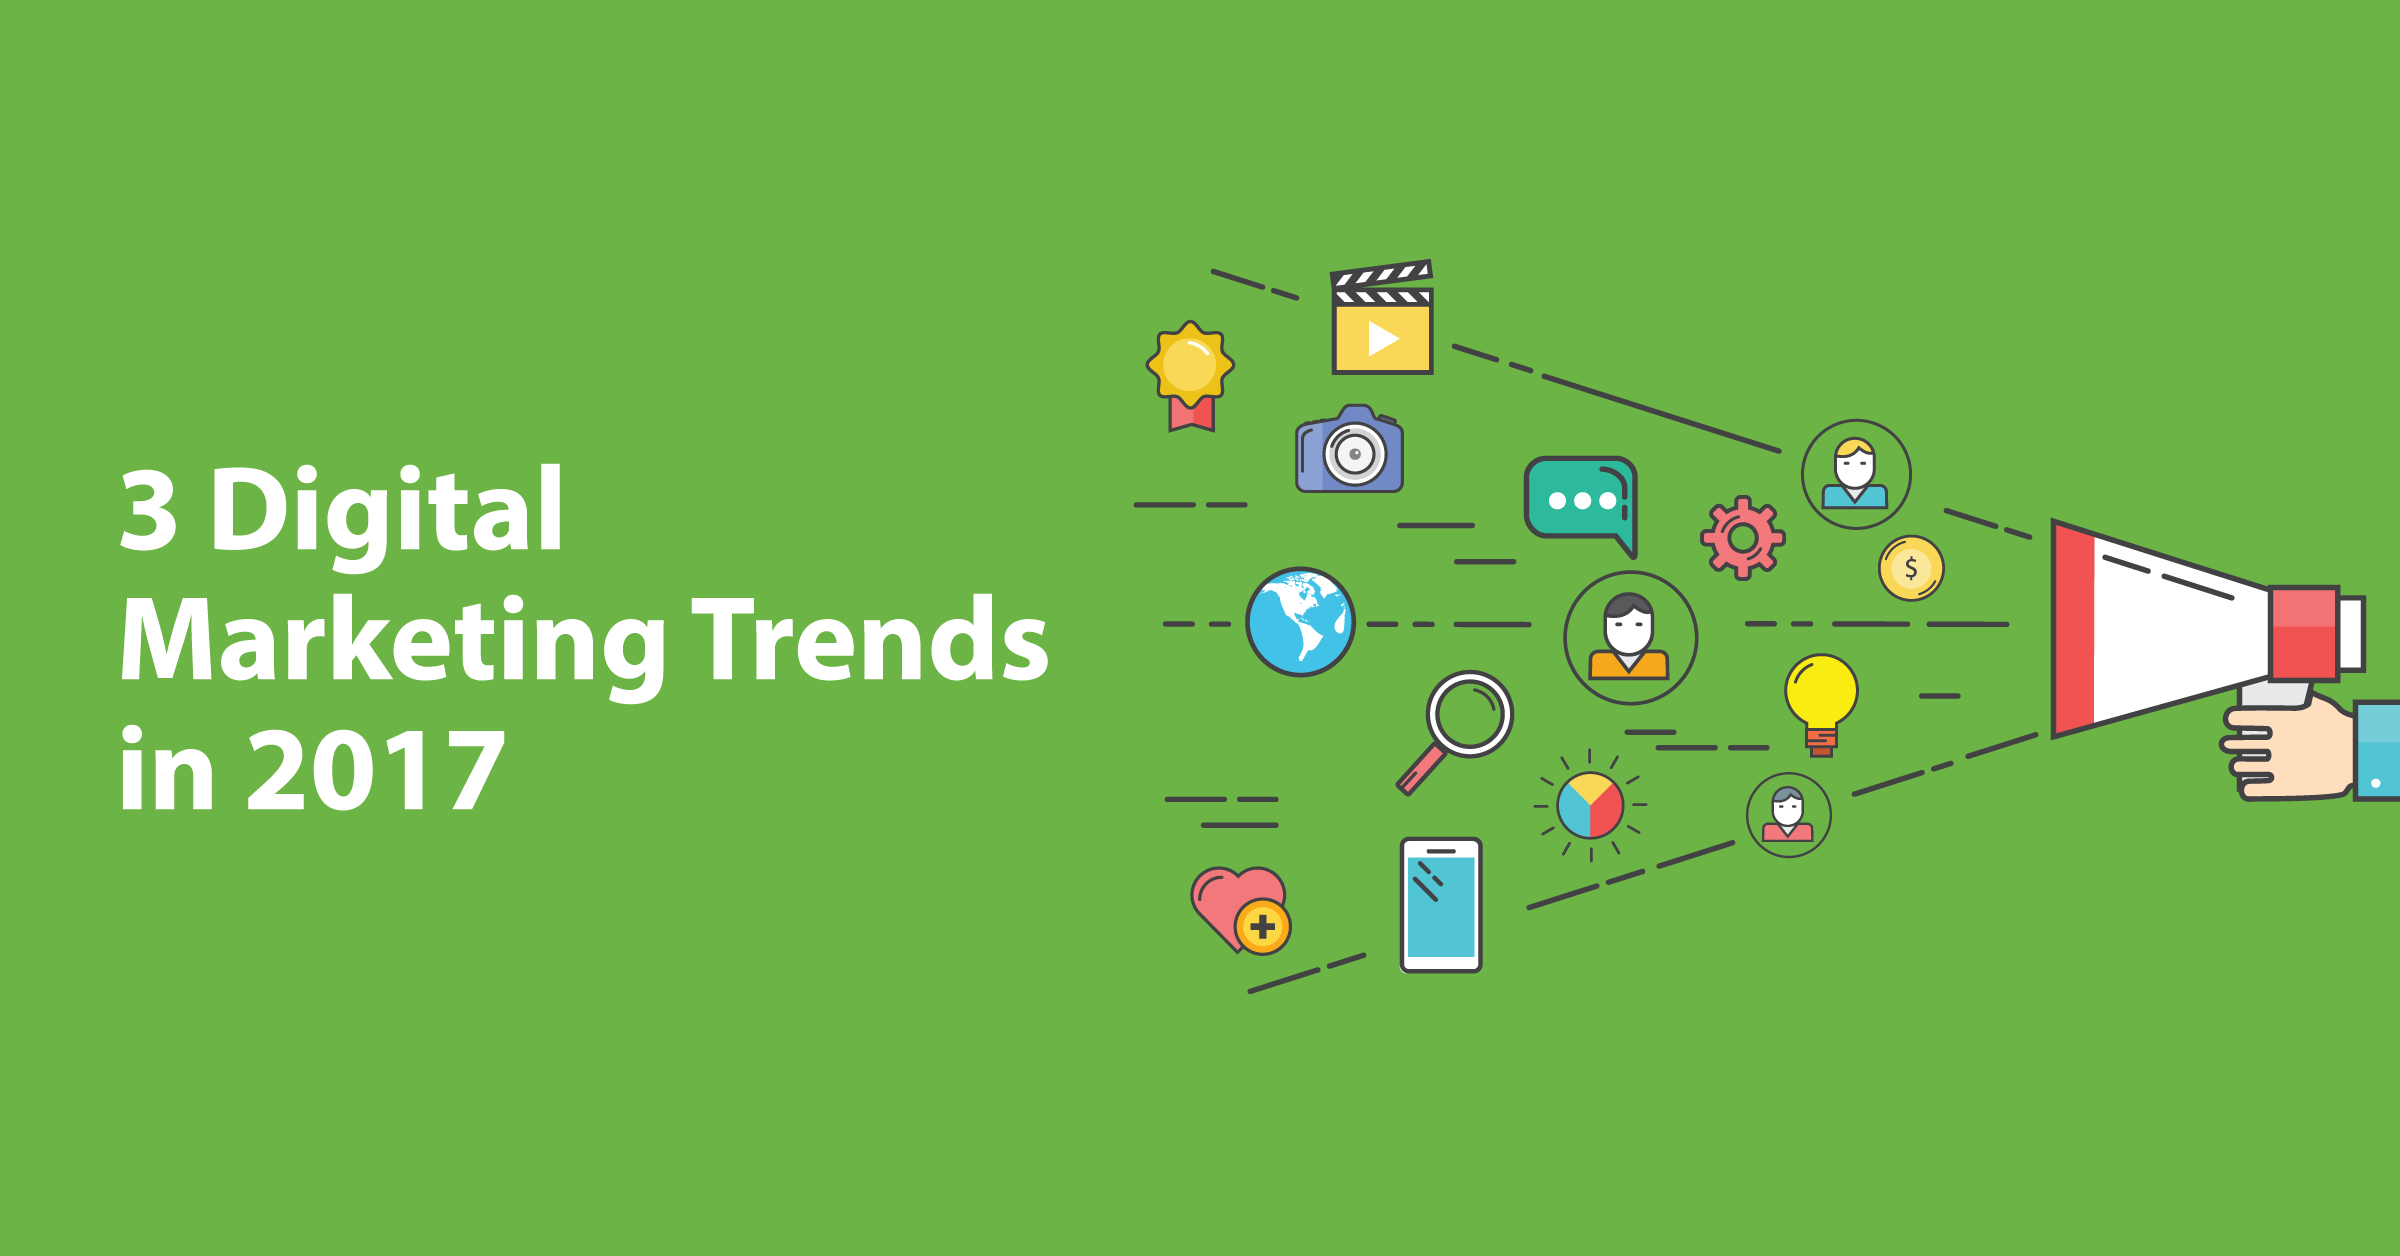 3 big digital marketing trends to explore in 2017